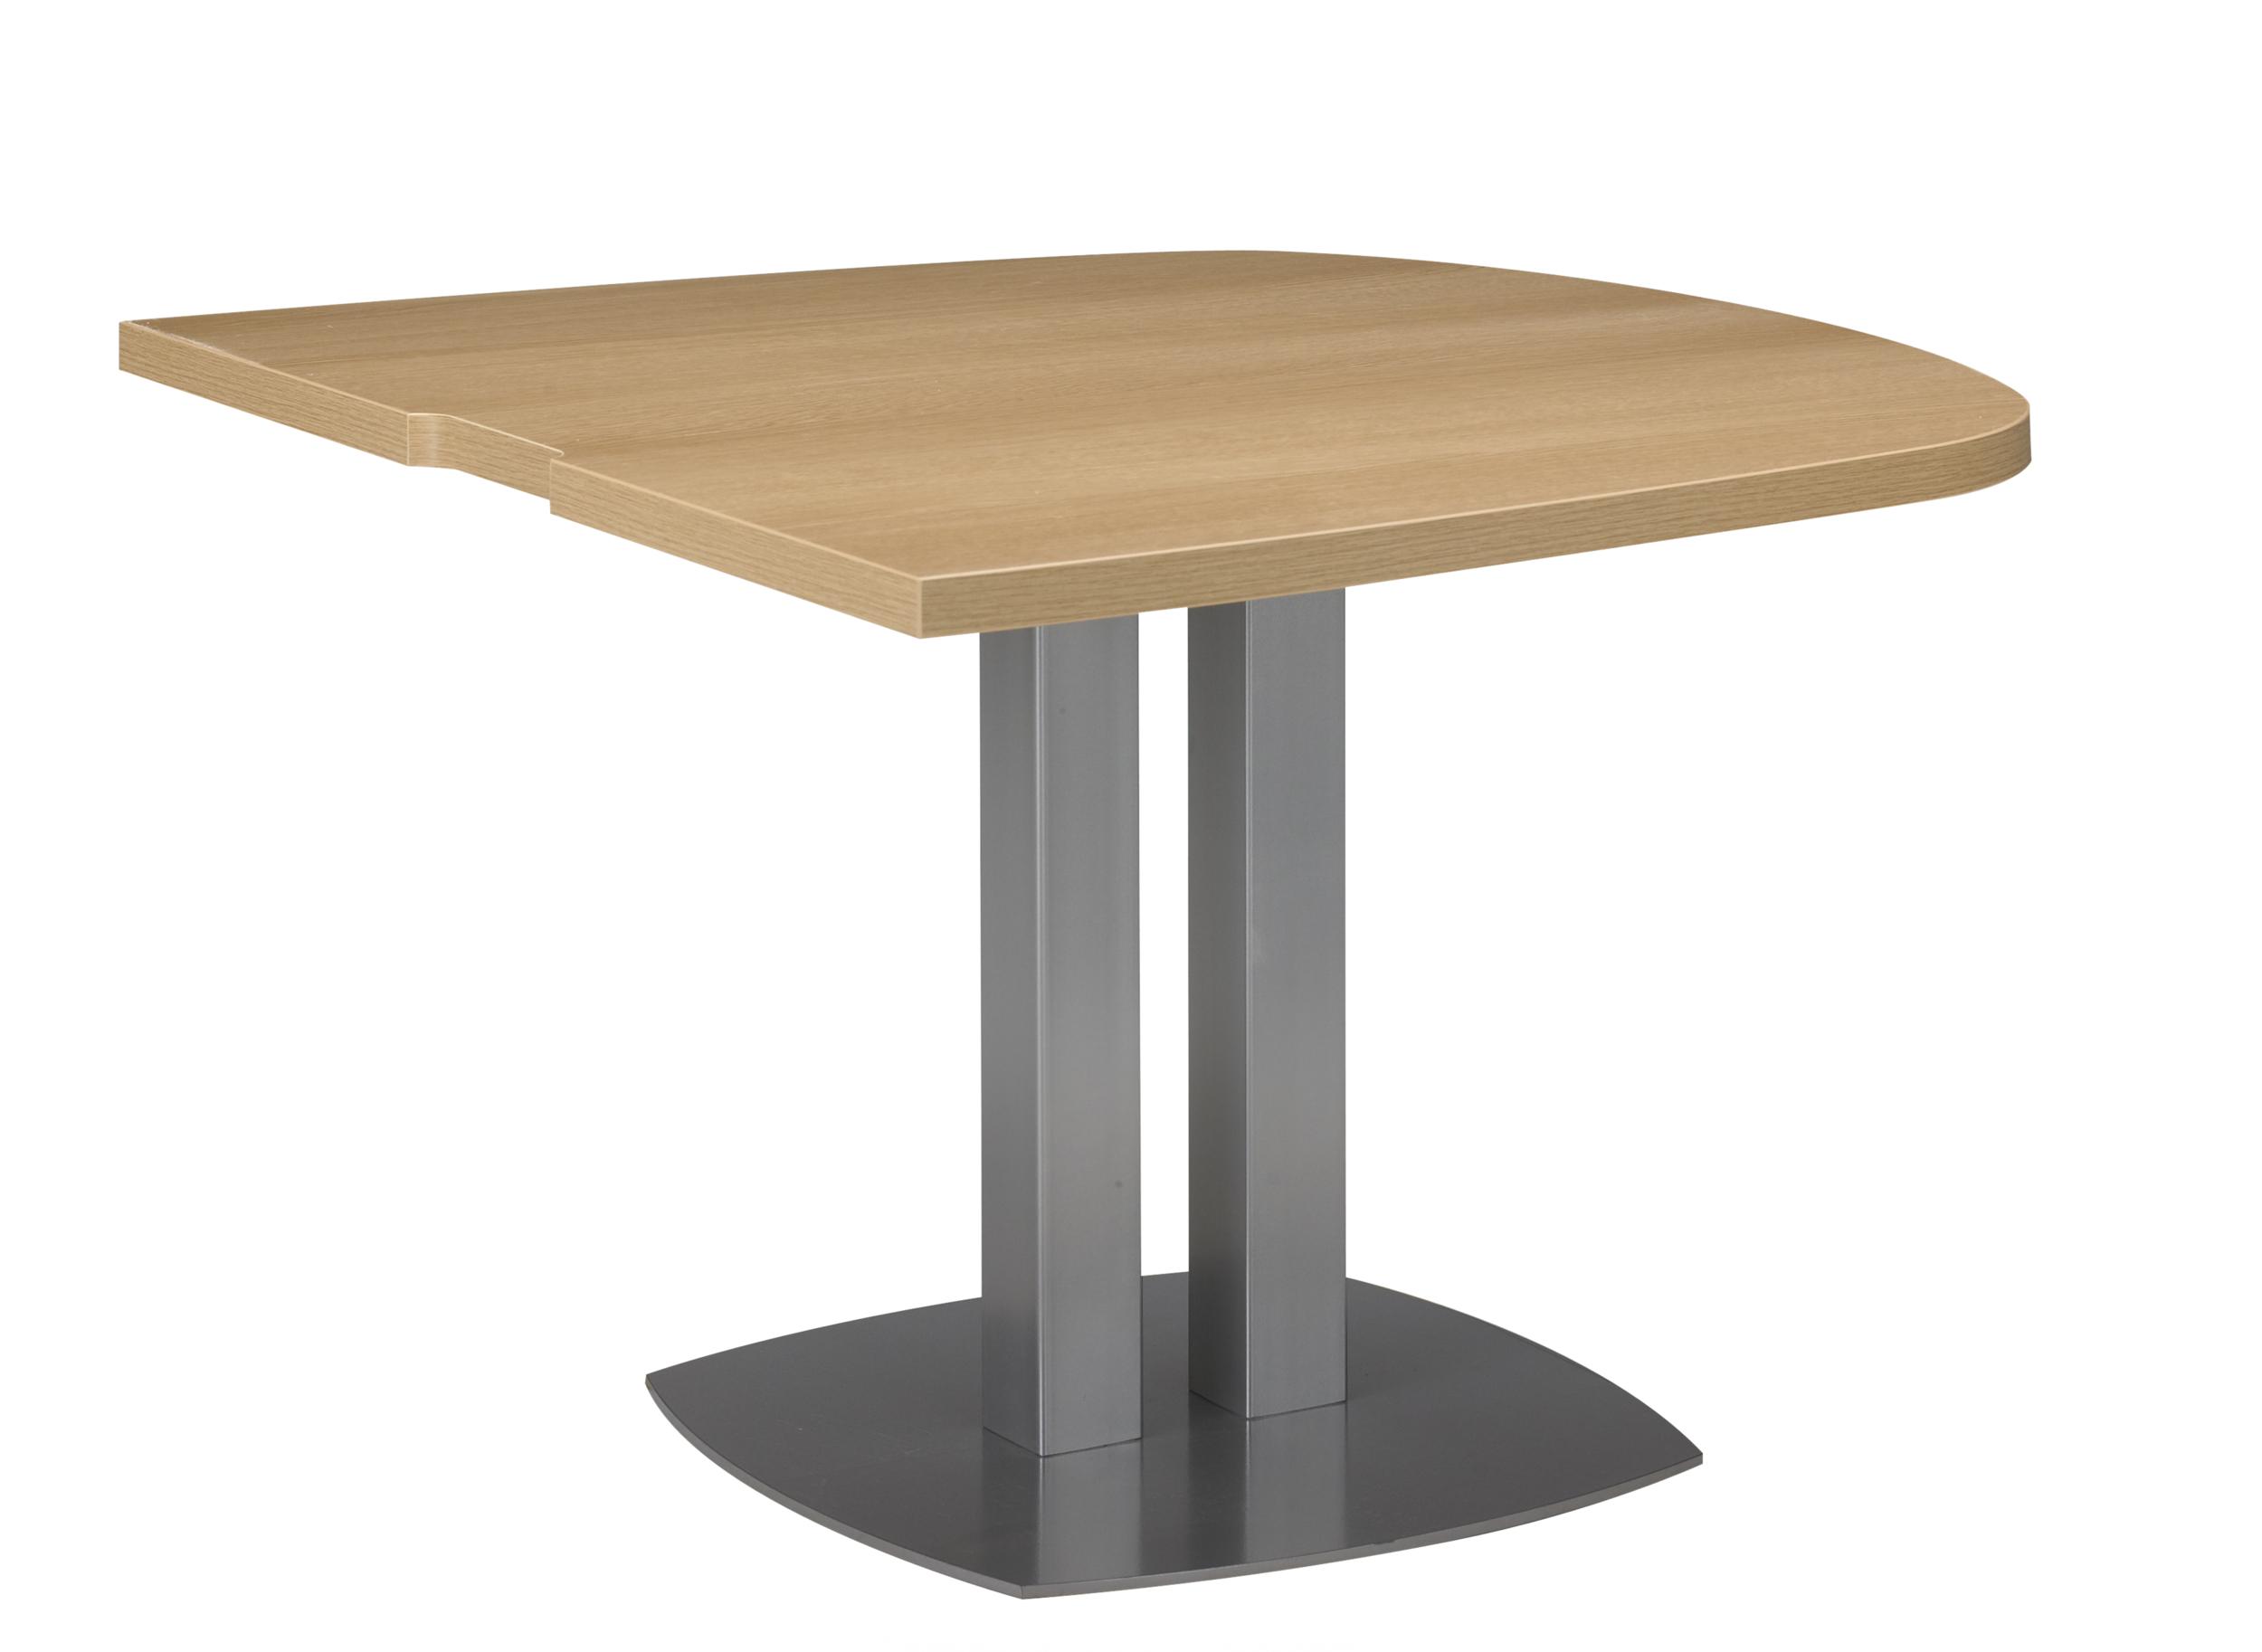 SLIVER CHÊNE TABLE ½ OVALE PIED MÉTAL GRIS